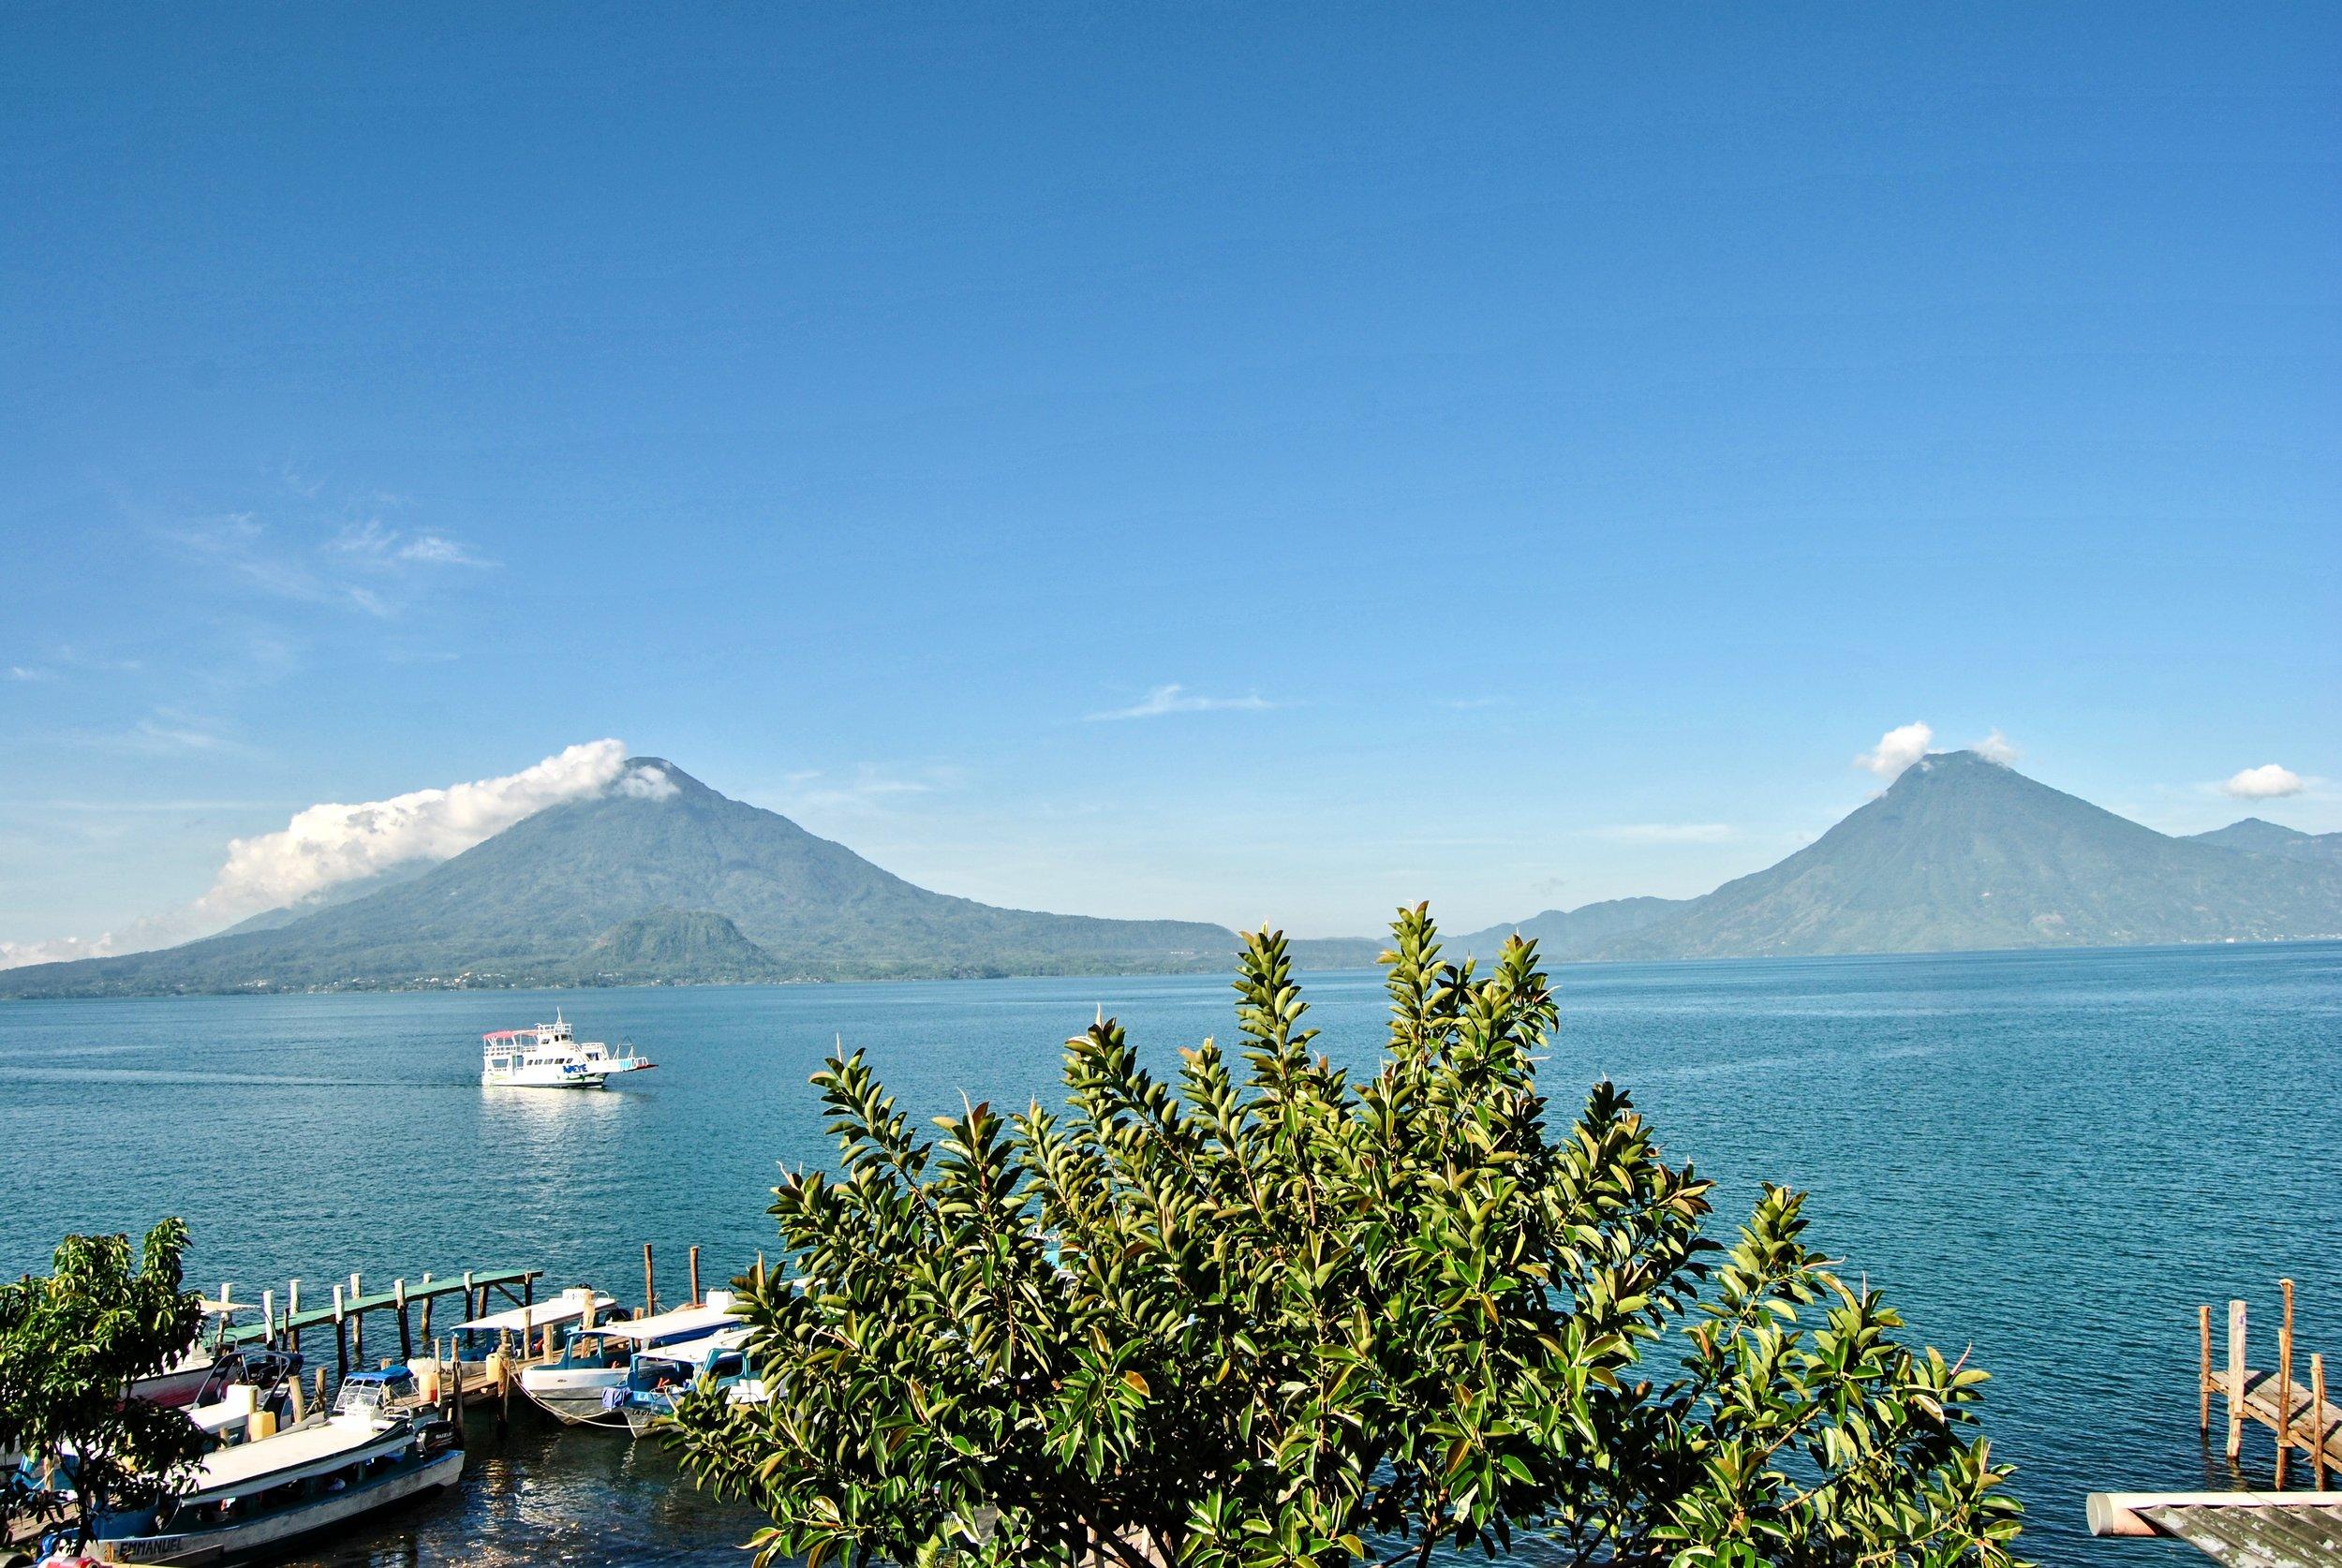 Journey with the Maya - Lake Atitlán, Guatemala